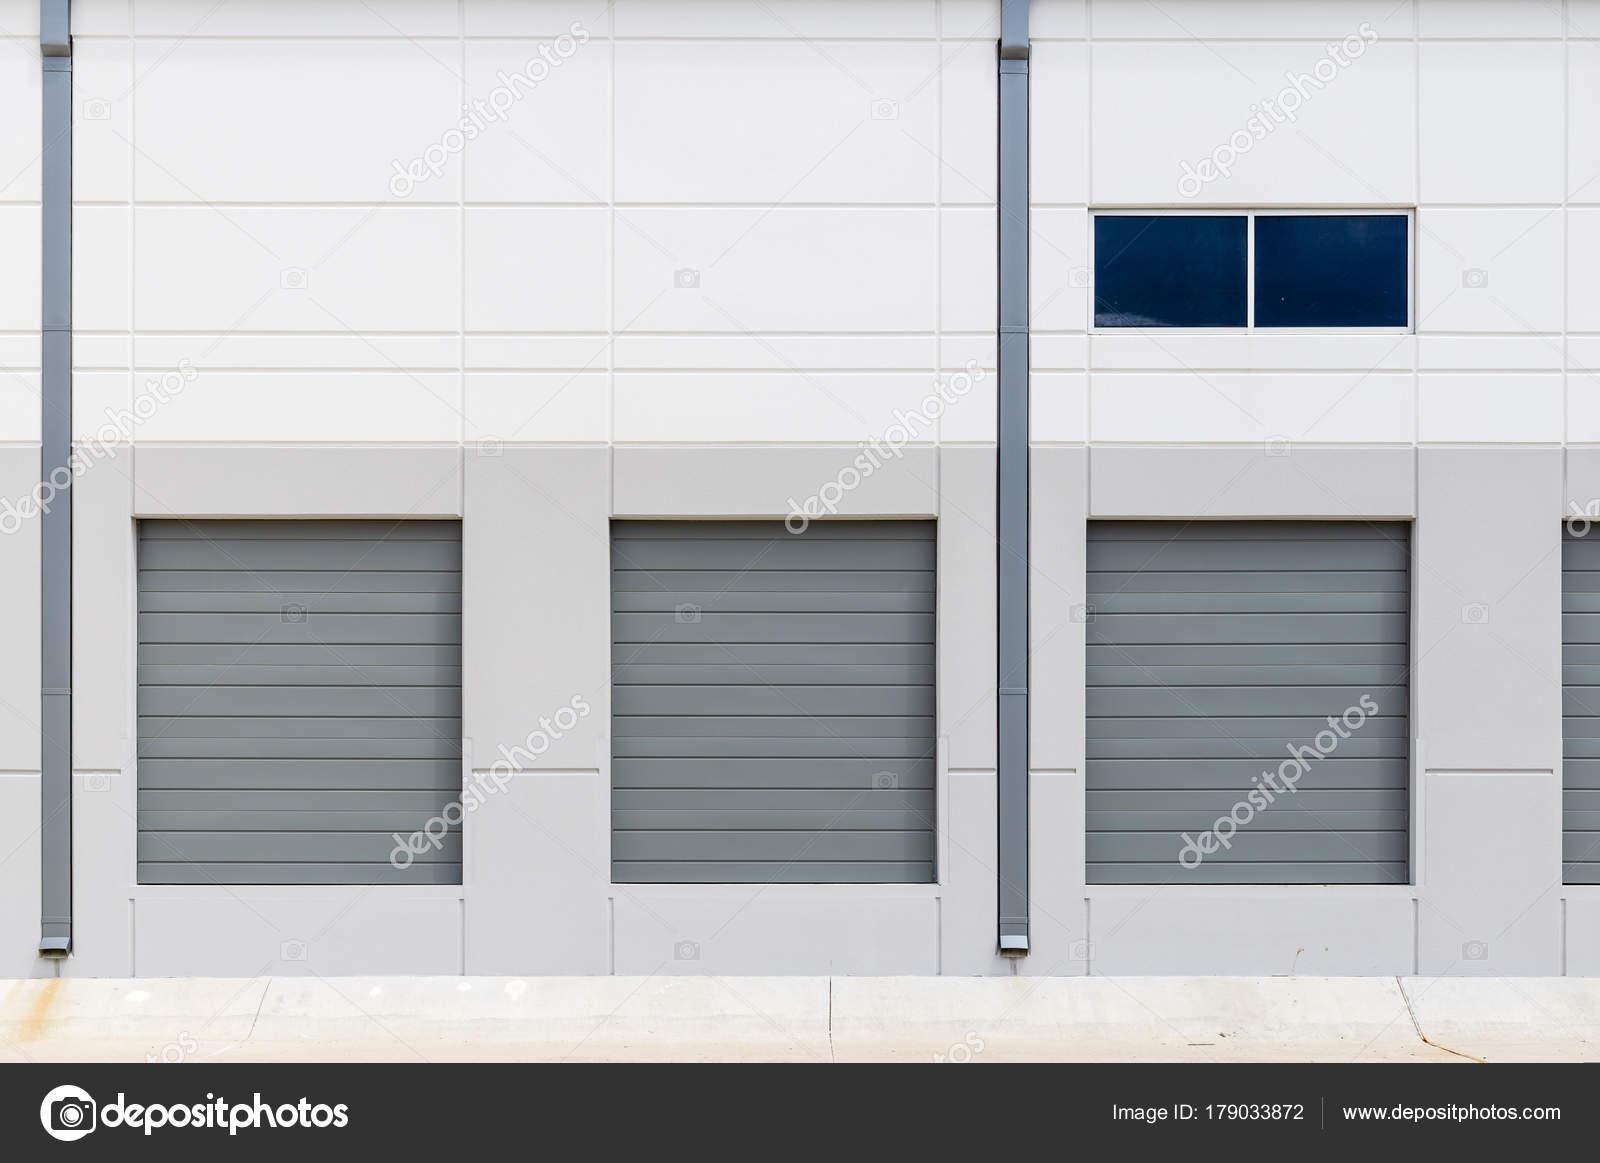 New Construction Warehouse Loading Dock Stock Photo Michelmond